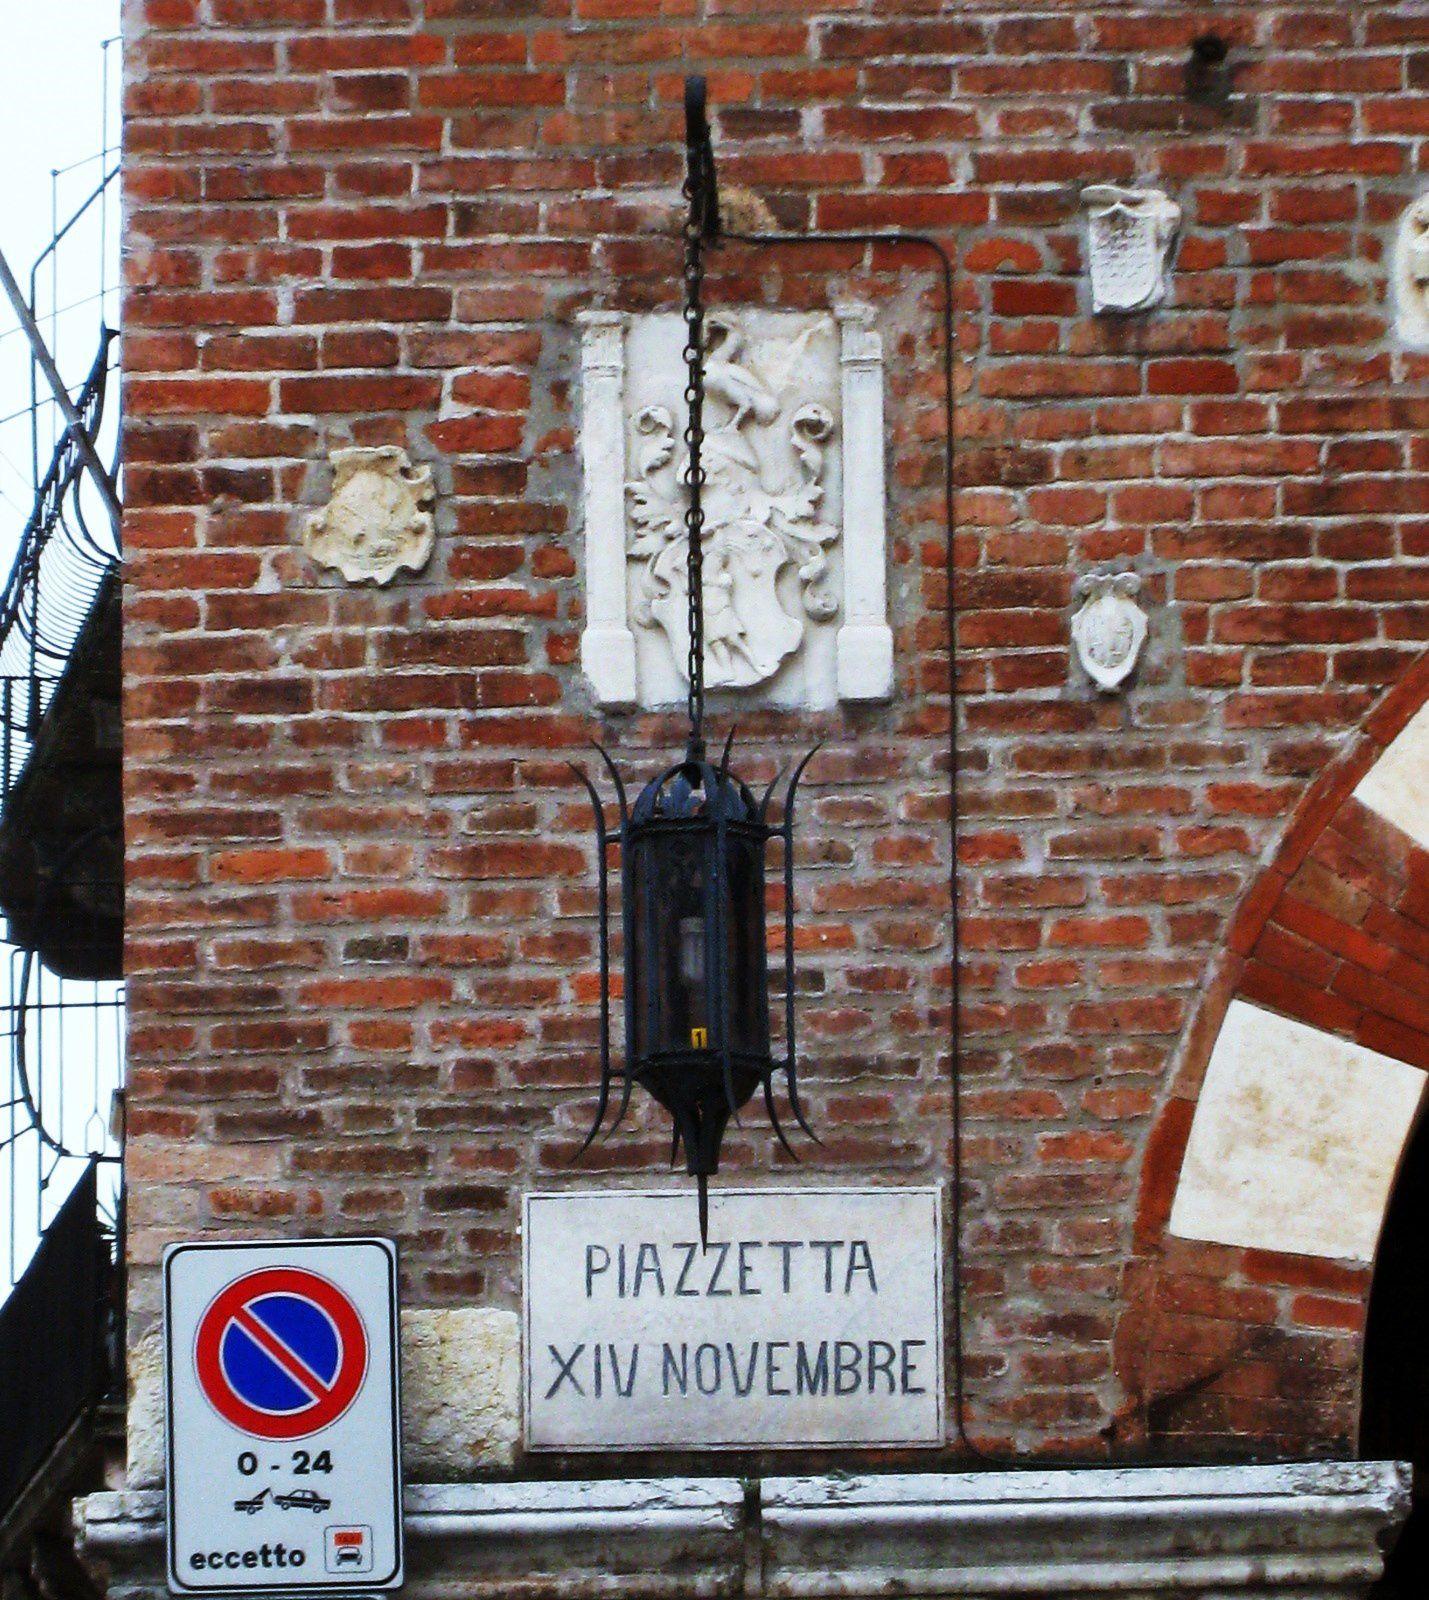 Piazzetta XIV novembre, Vérone